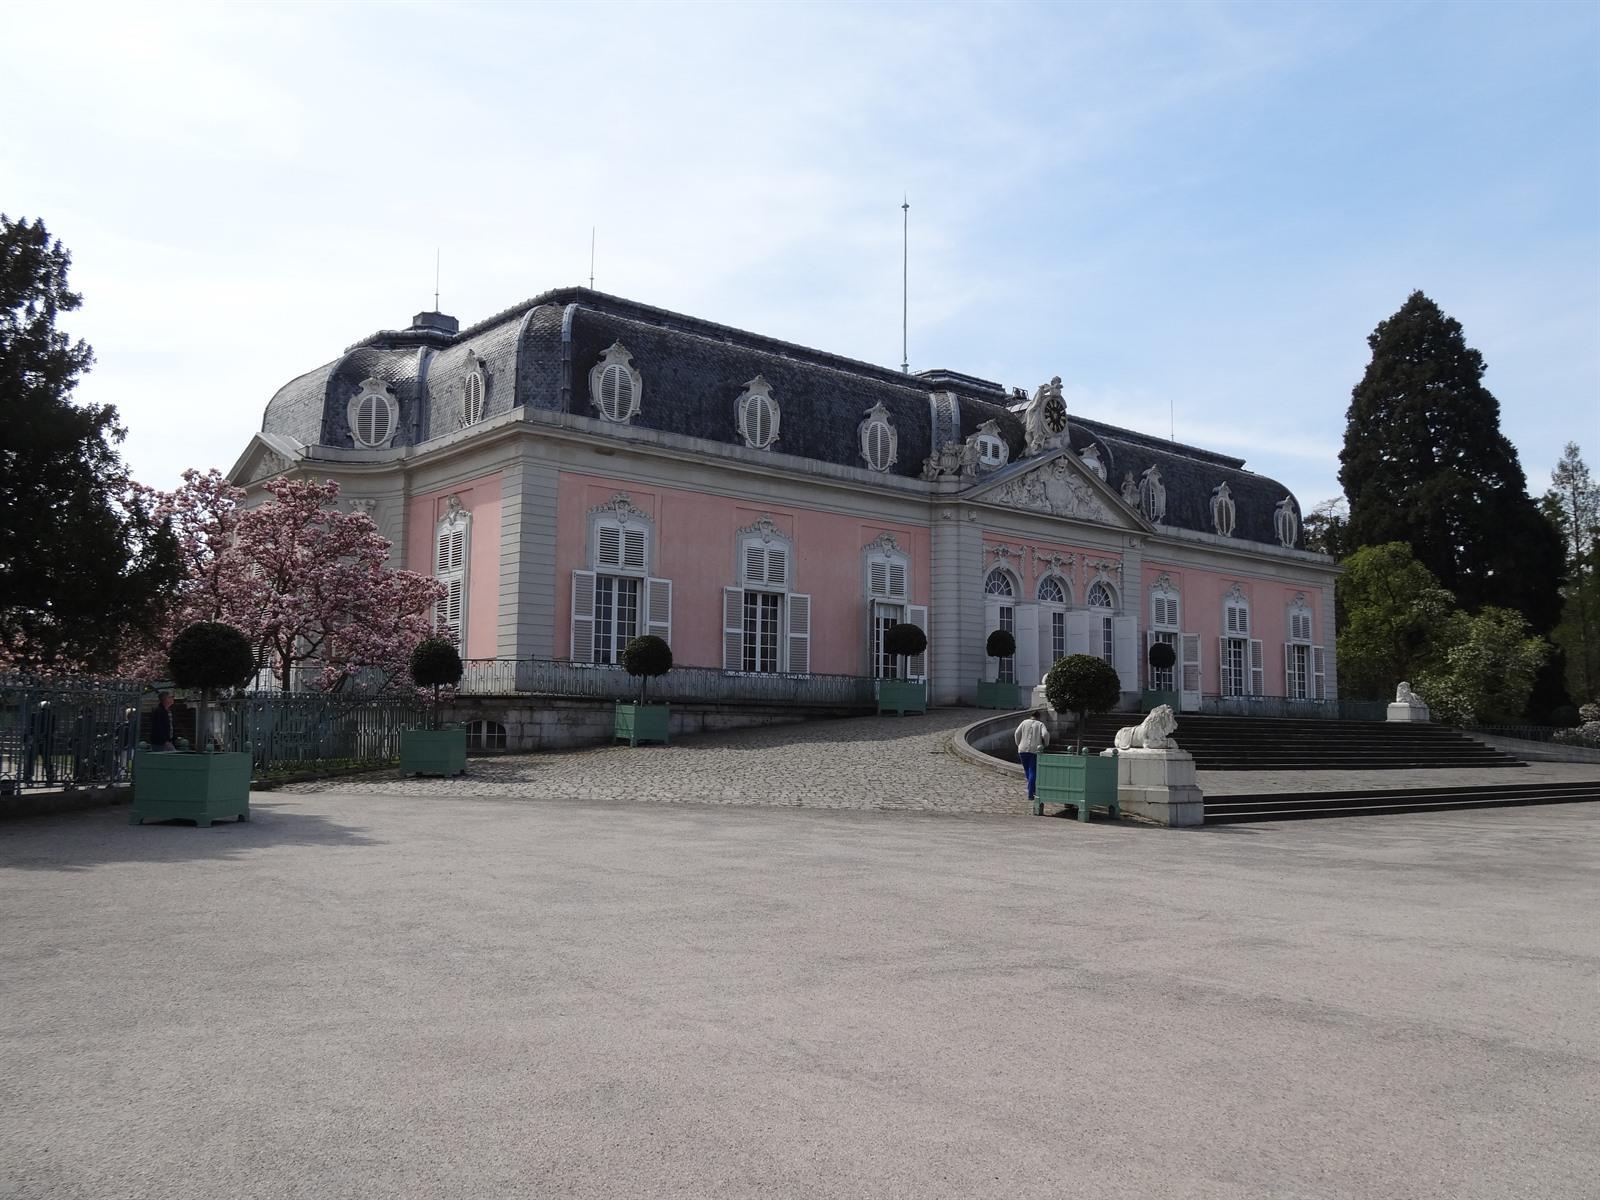 Schloss benrath dusseldorf 2287 2287 4 xl.jpg